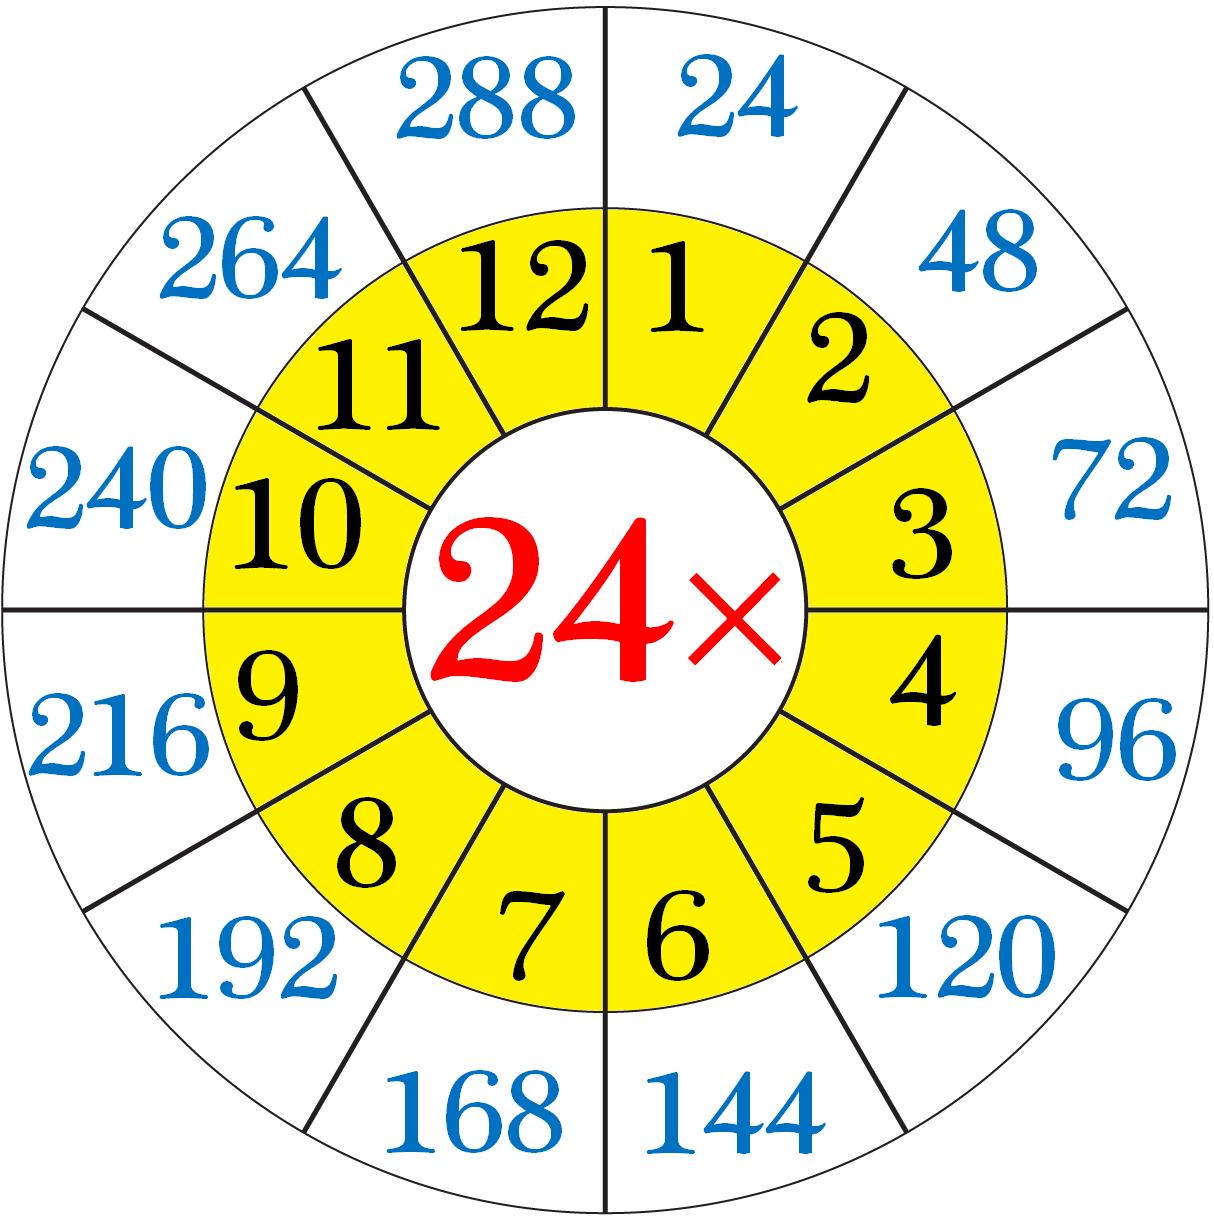 Worksheet On Multiplication Table Of 24